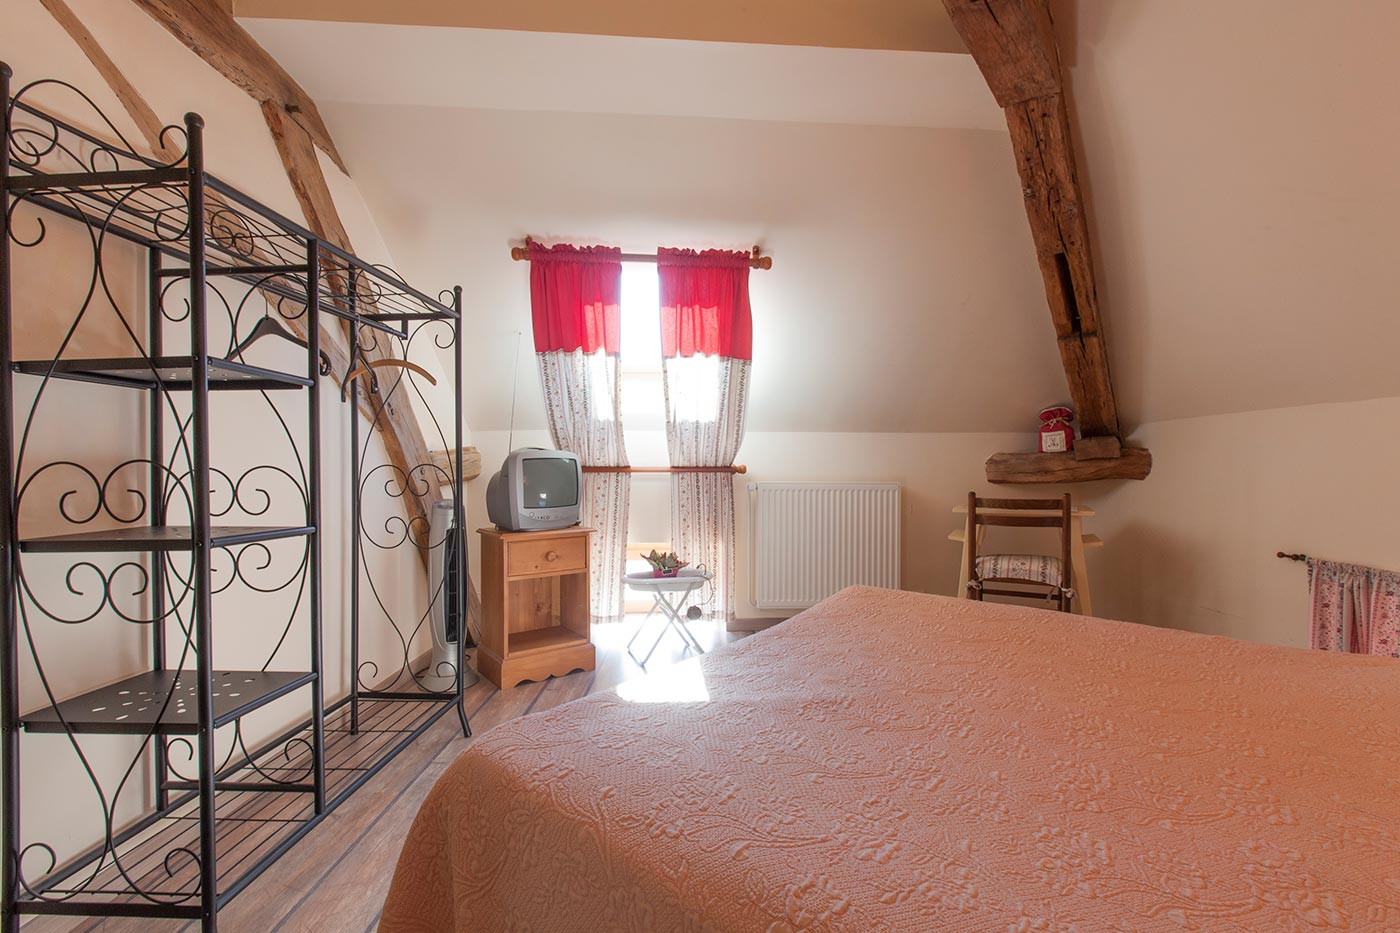 chambre d 39 h tes beaune 4 chambres d 39 h tes quelques kilom tres de beaune. Black Bedroom Furniture Sets. Home Design Ideas